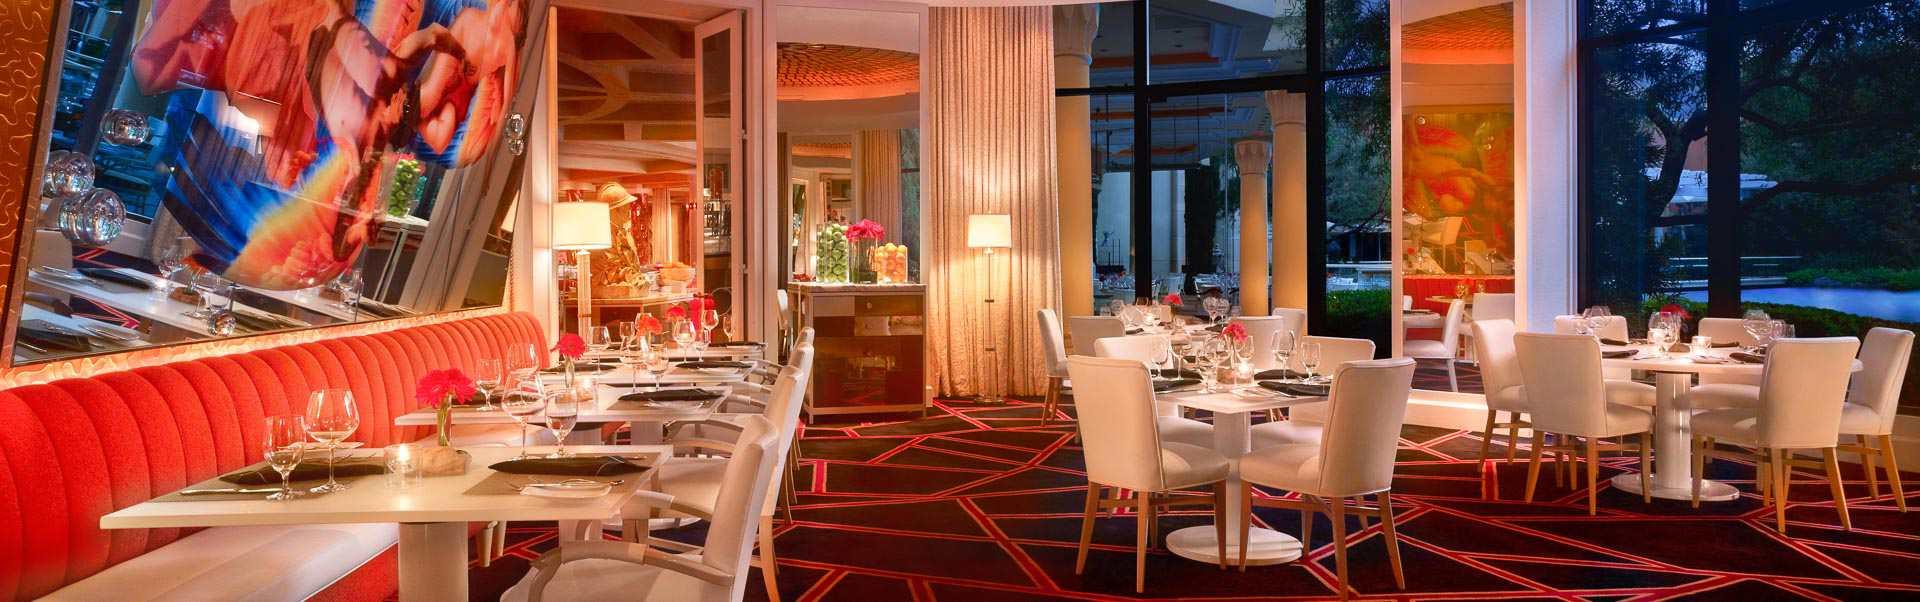 Lakeside at Wynn Las Vegas Dining Room